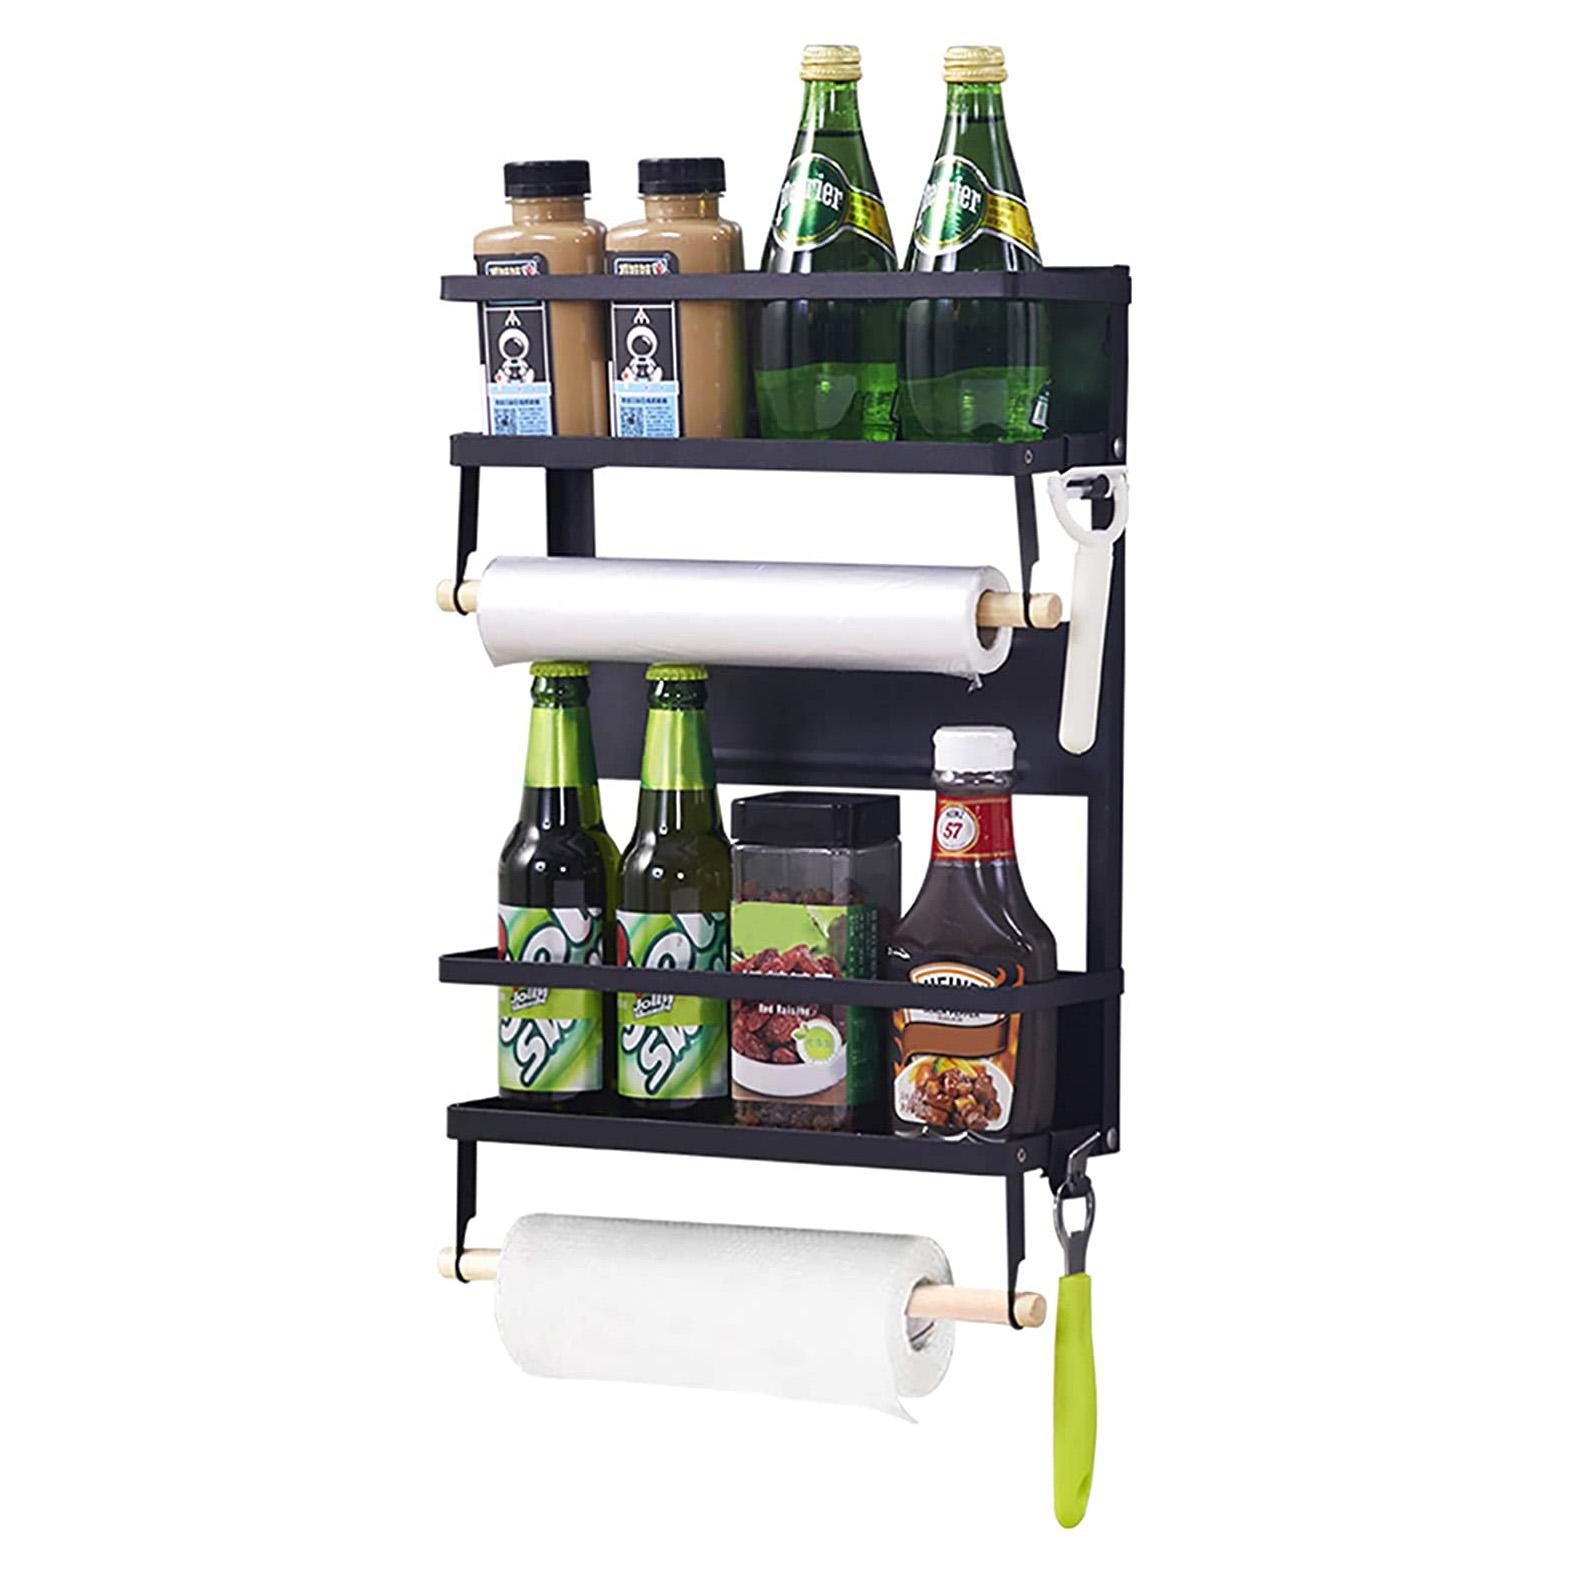 magnetic fridge organizer spice rack with paper towel holder and 5 extra hooks 4 tier magnet refrigerator shelf in kitchen buy fridge